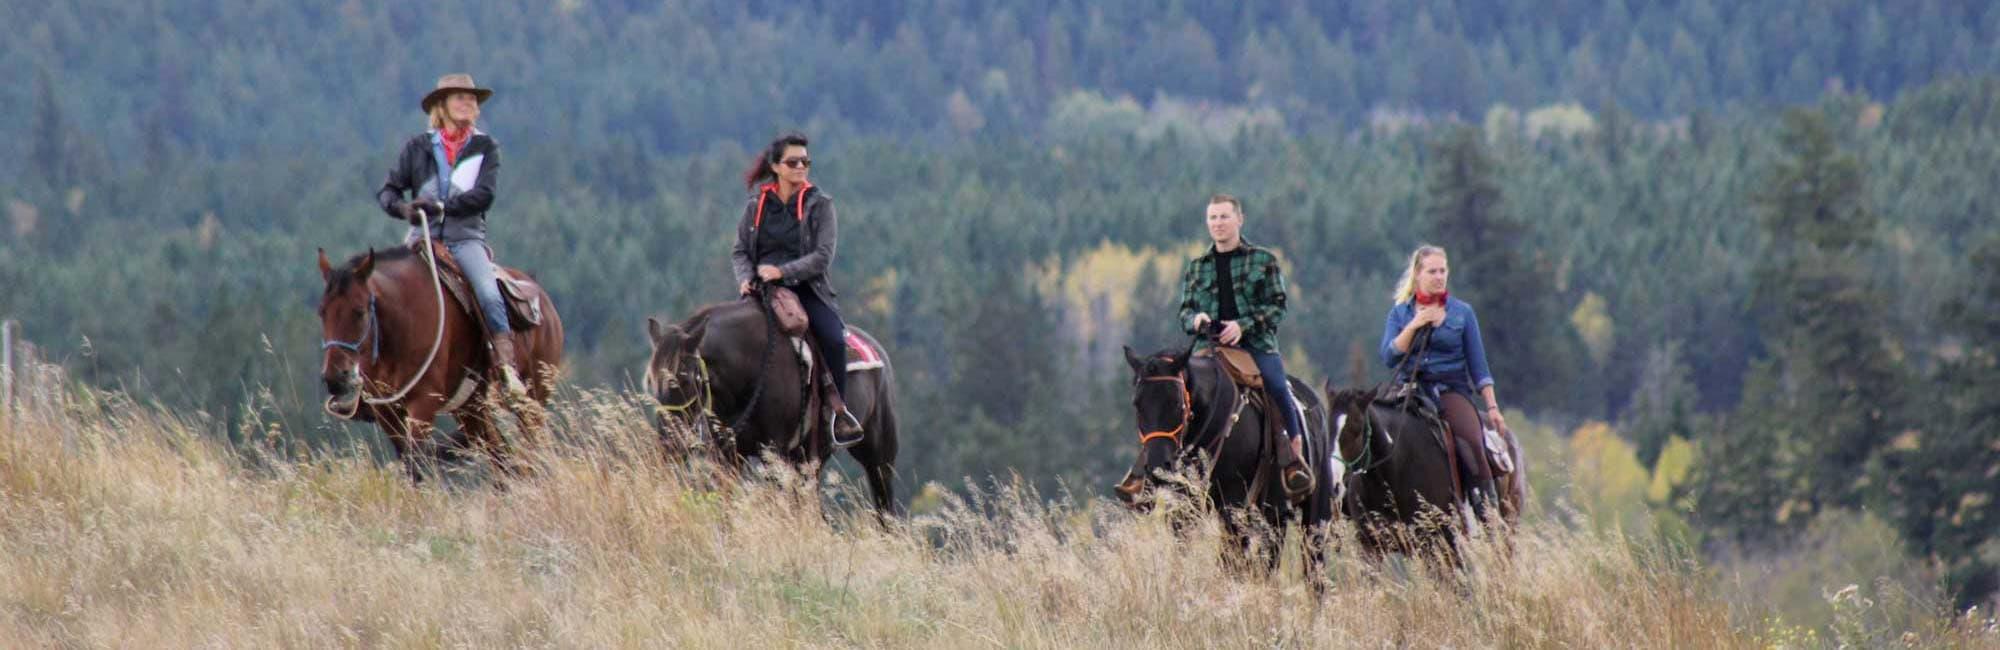 trail ride alpine meadows